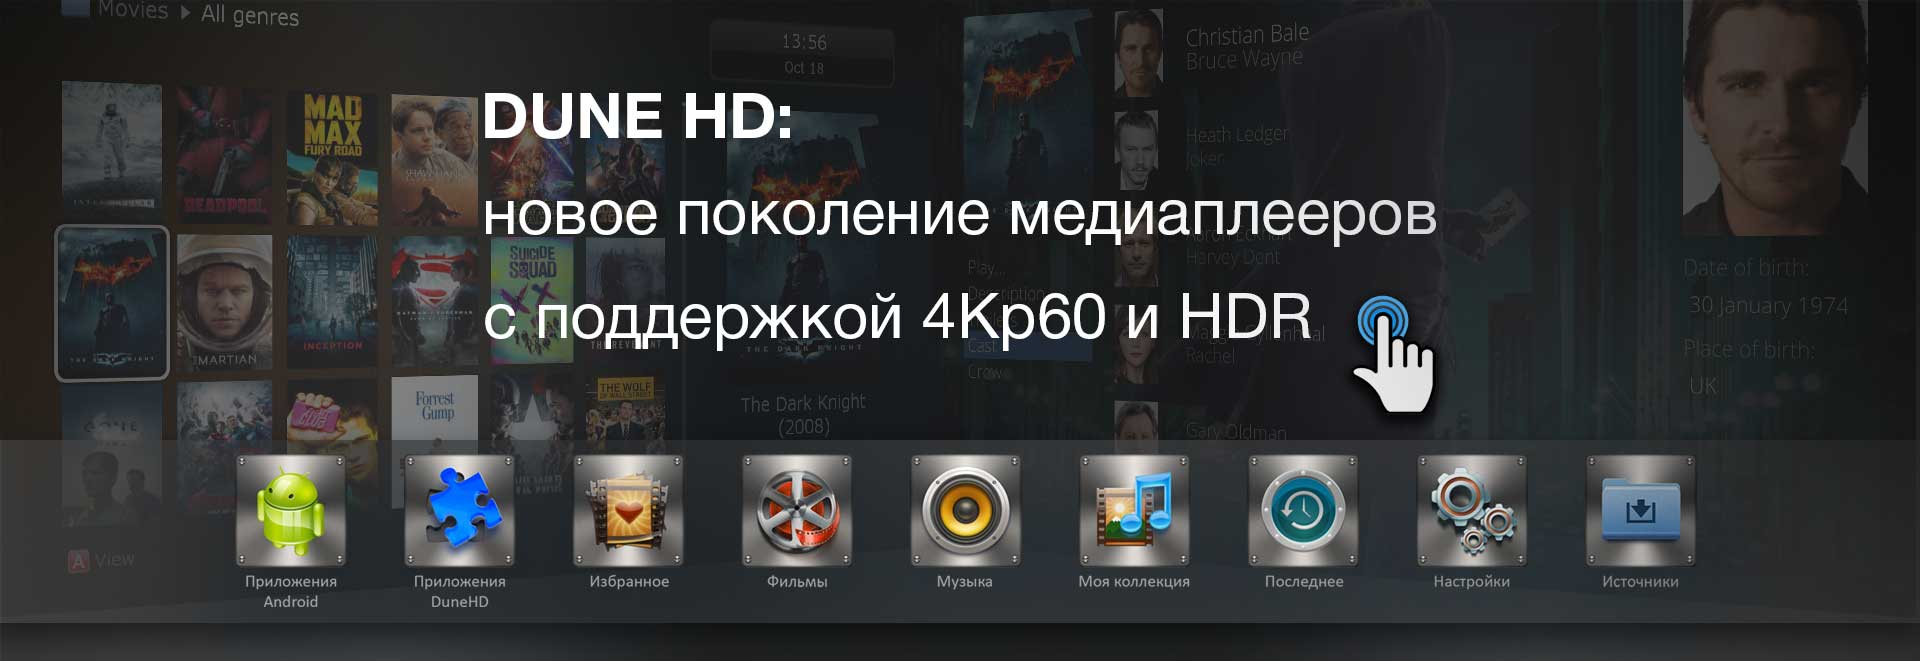 Dune HD SmartBox 4K Plus